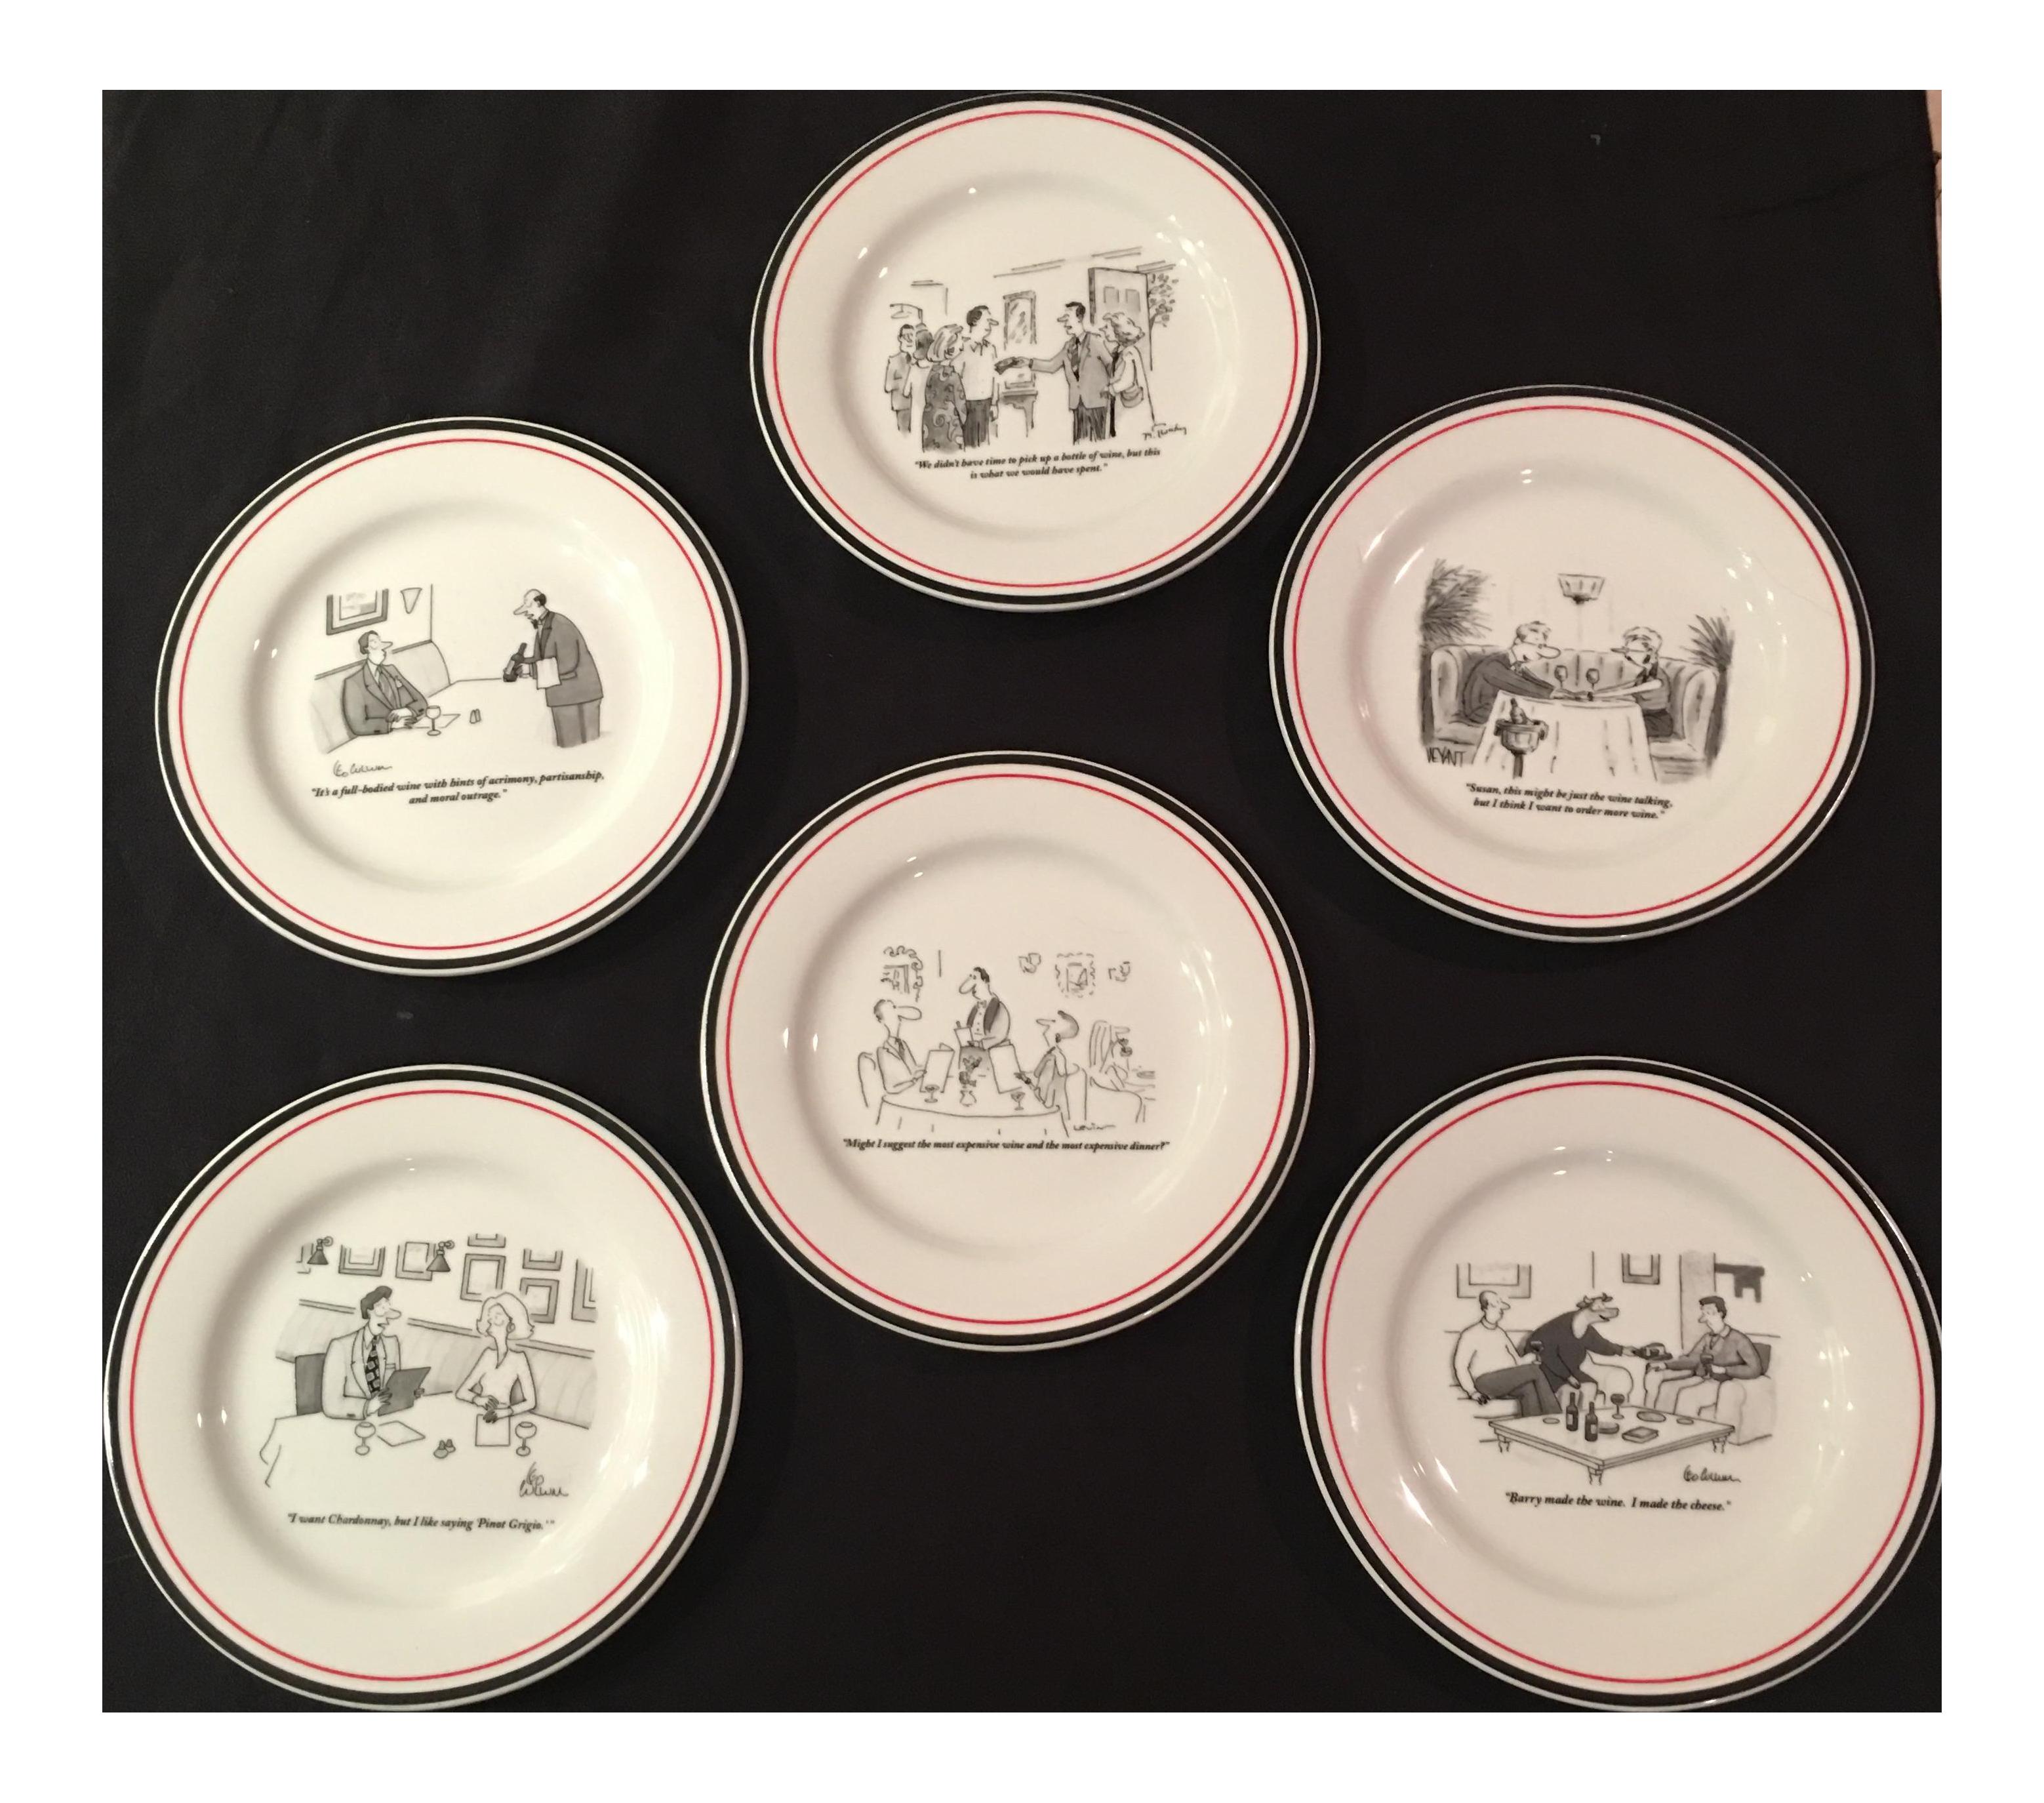 sc 1 st  Chairish & The New Yorker Cartoon Dessert Plates - Set of 6 | Chairish